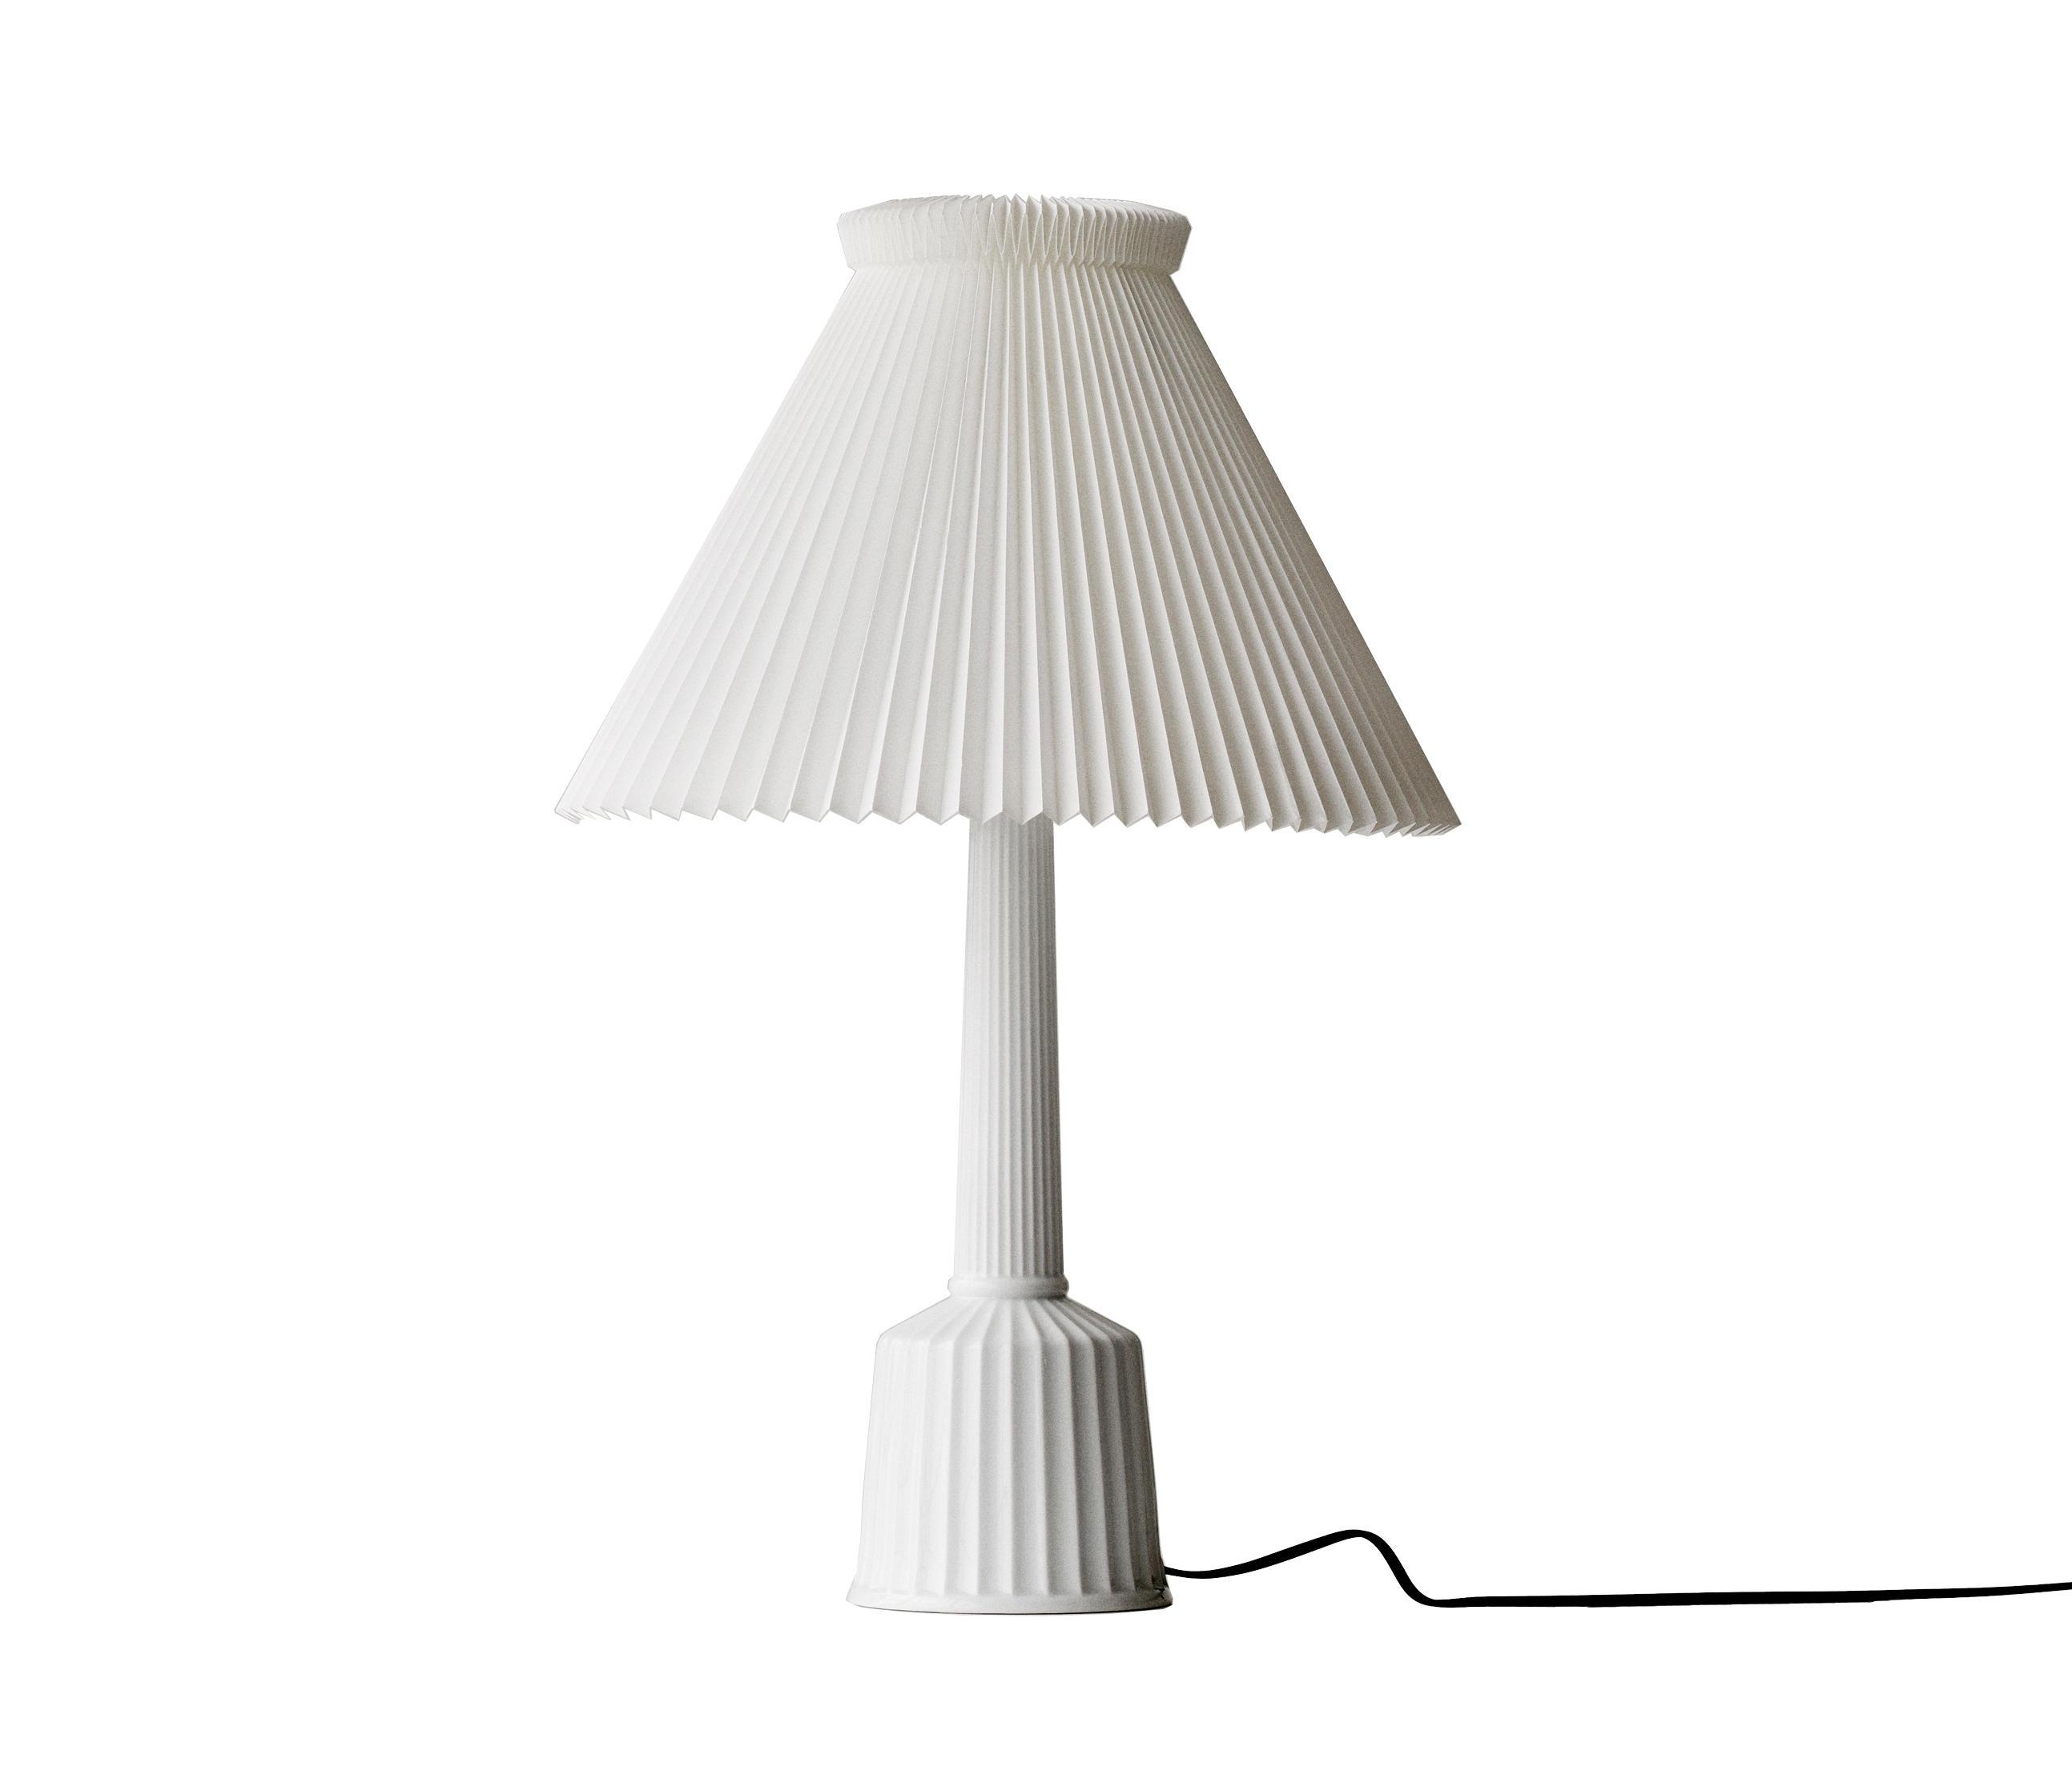 klint lighting. Esben Klint Lamp By Lyngby Porcelæn | Table Lights Klint Lighting